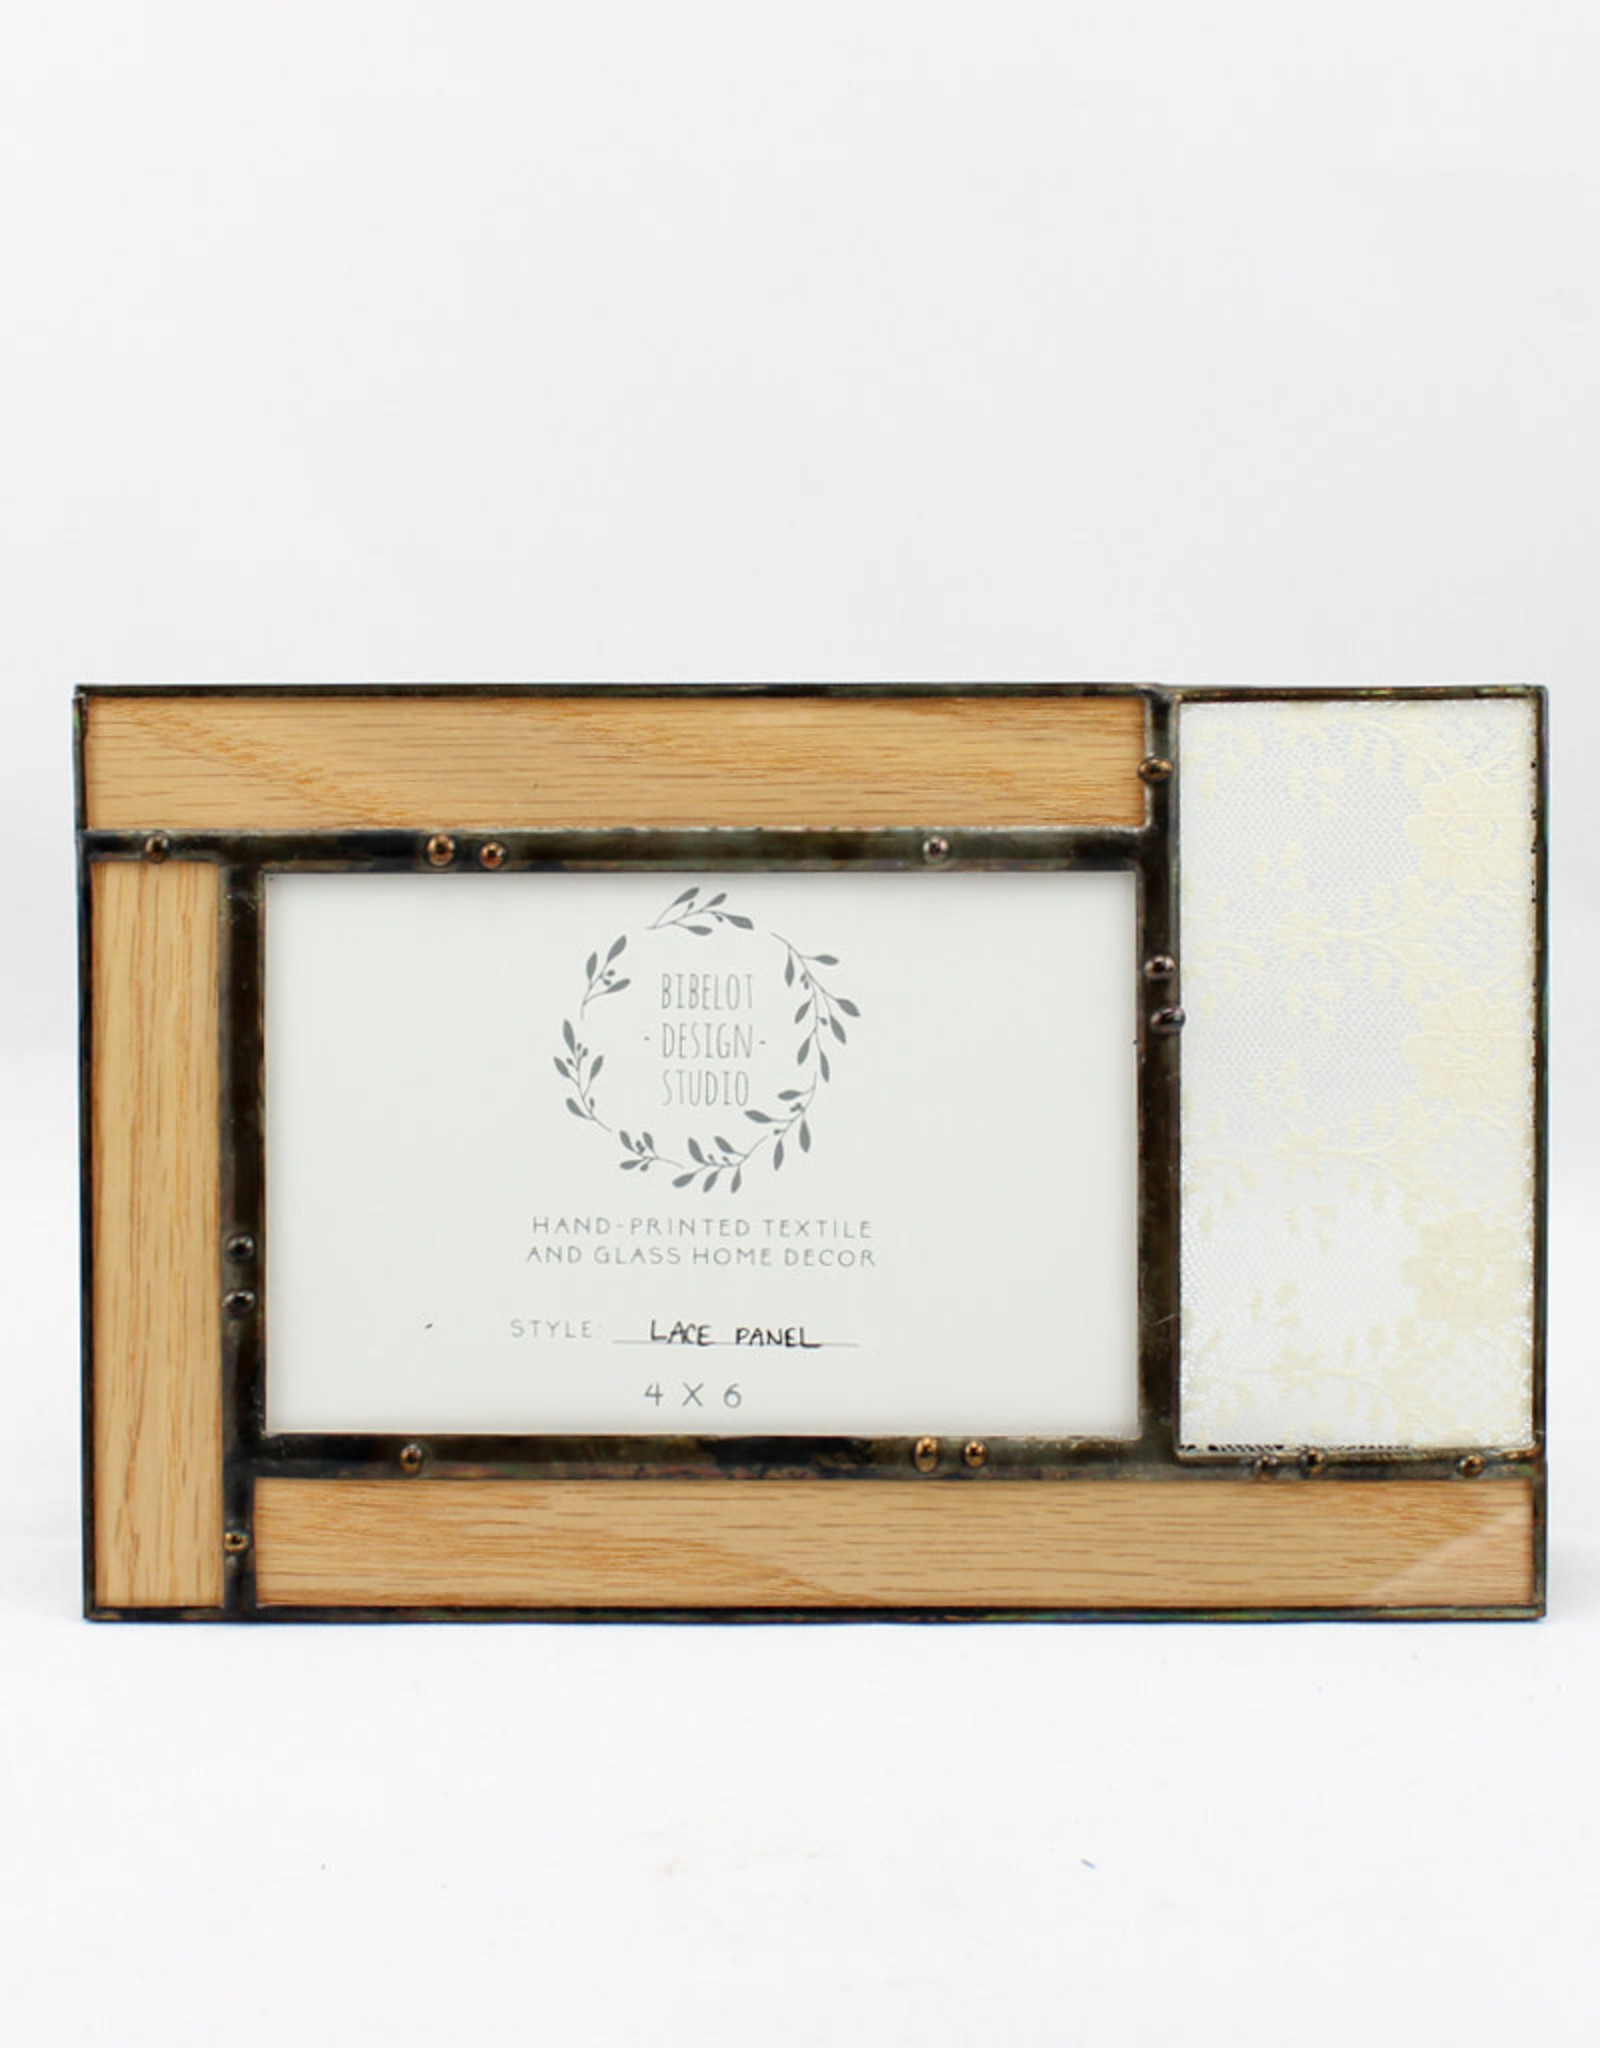 Bibleot Designs 4x6 Lace Panel Picture Frame